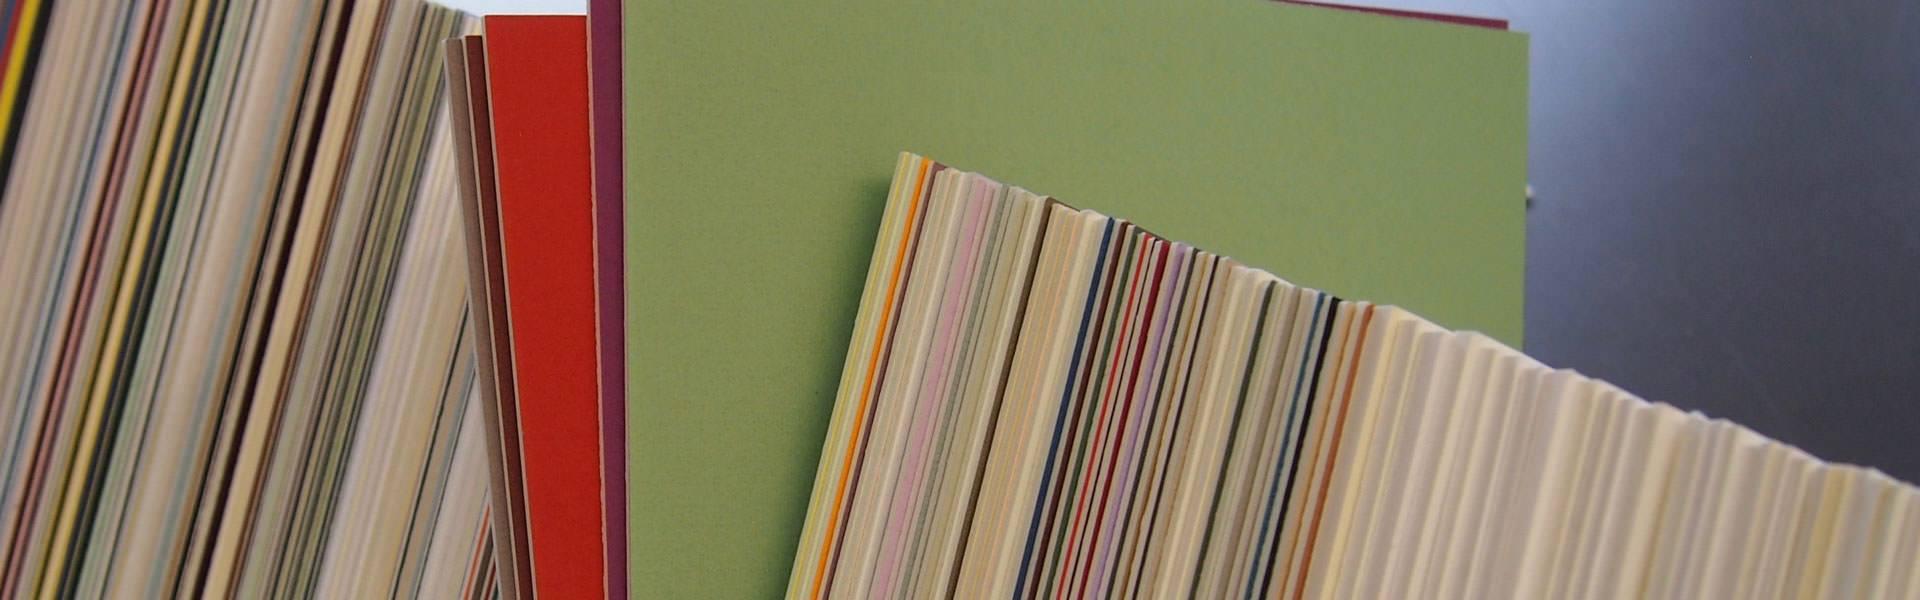 Passepartoutskarton - Buchbinderei Papierhandwerk